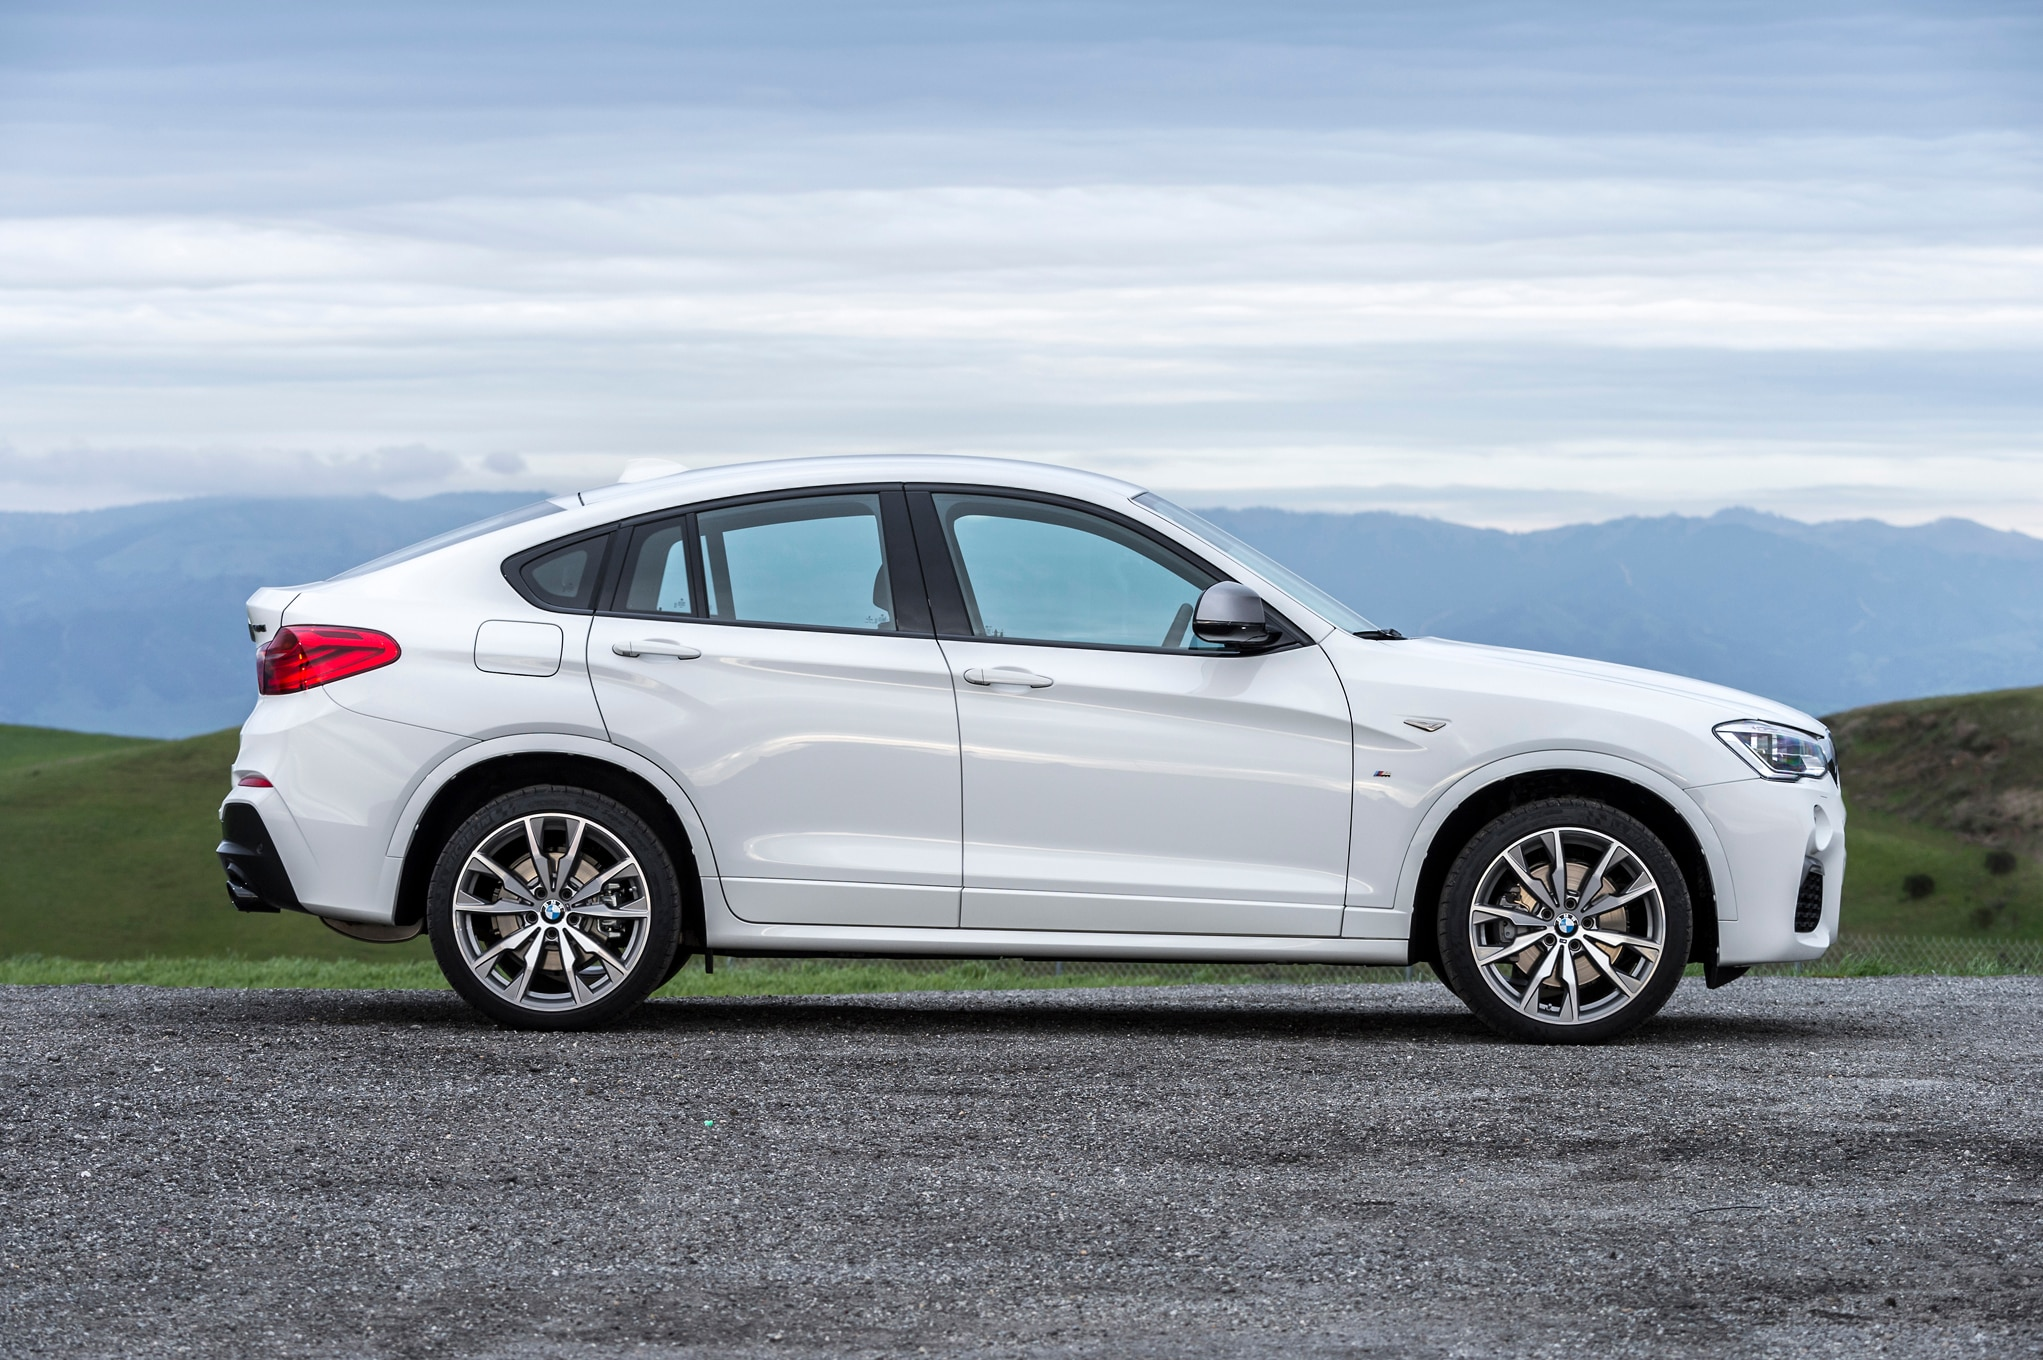 8 Passenger Suv >> 2016 BMW X4 M40i Review